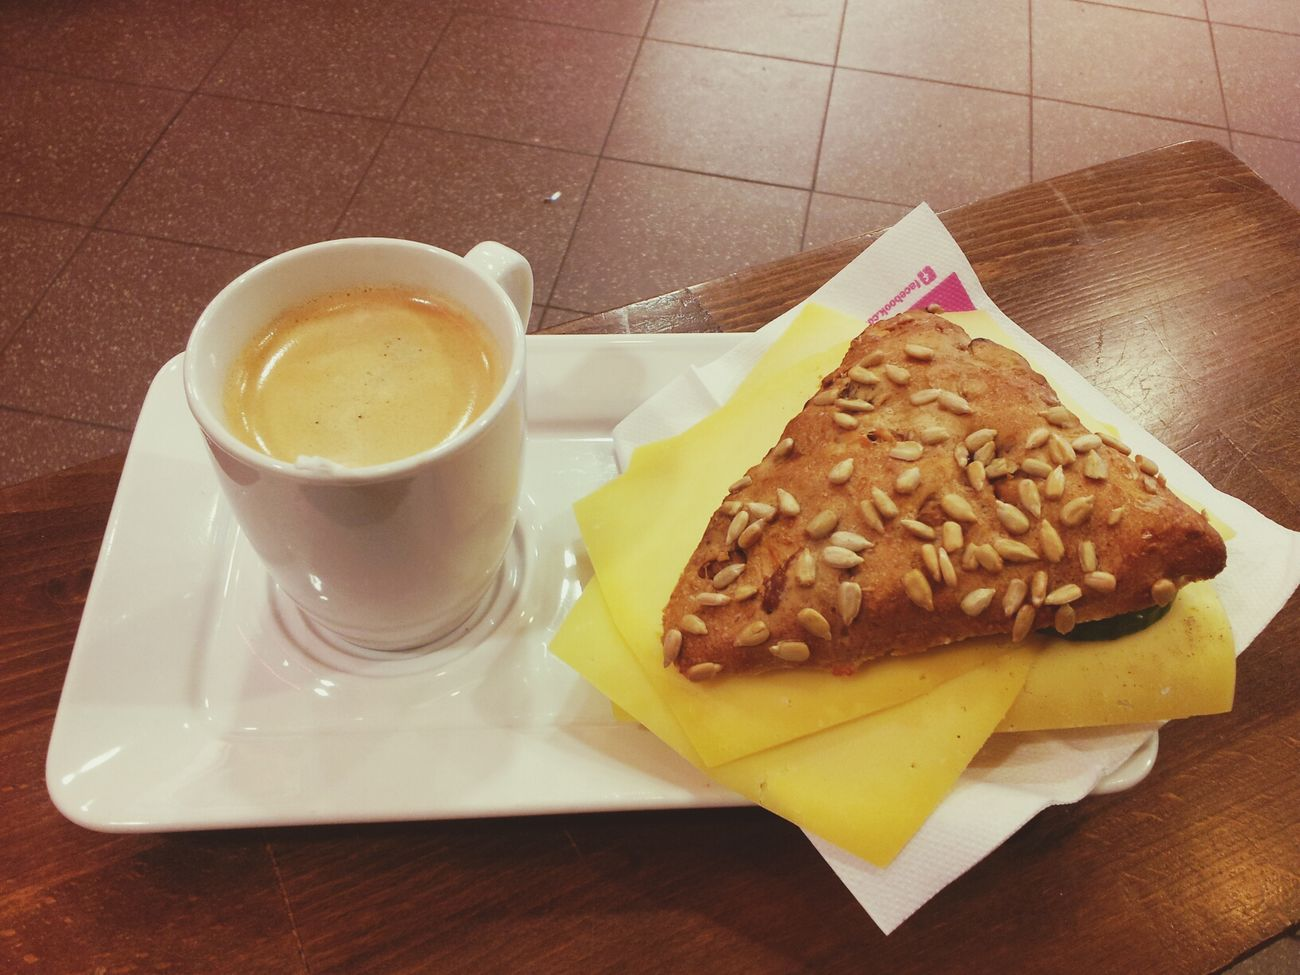 Broodjekaas Lunch Break Dutch Food Enjoying Life